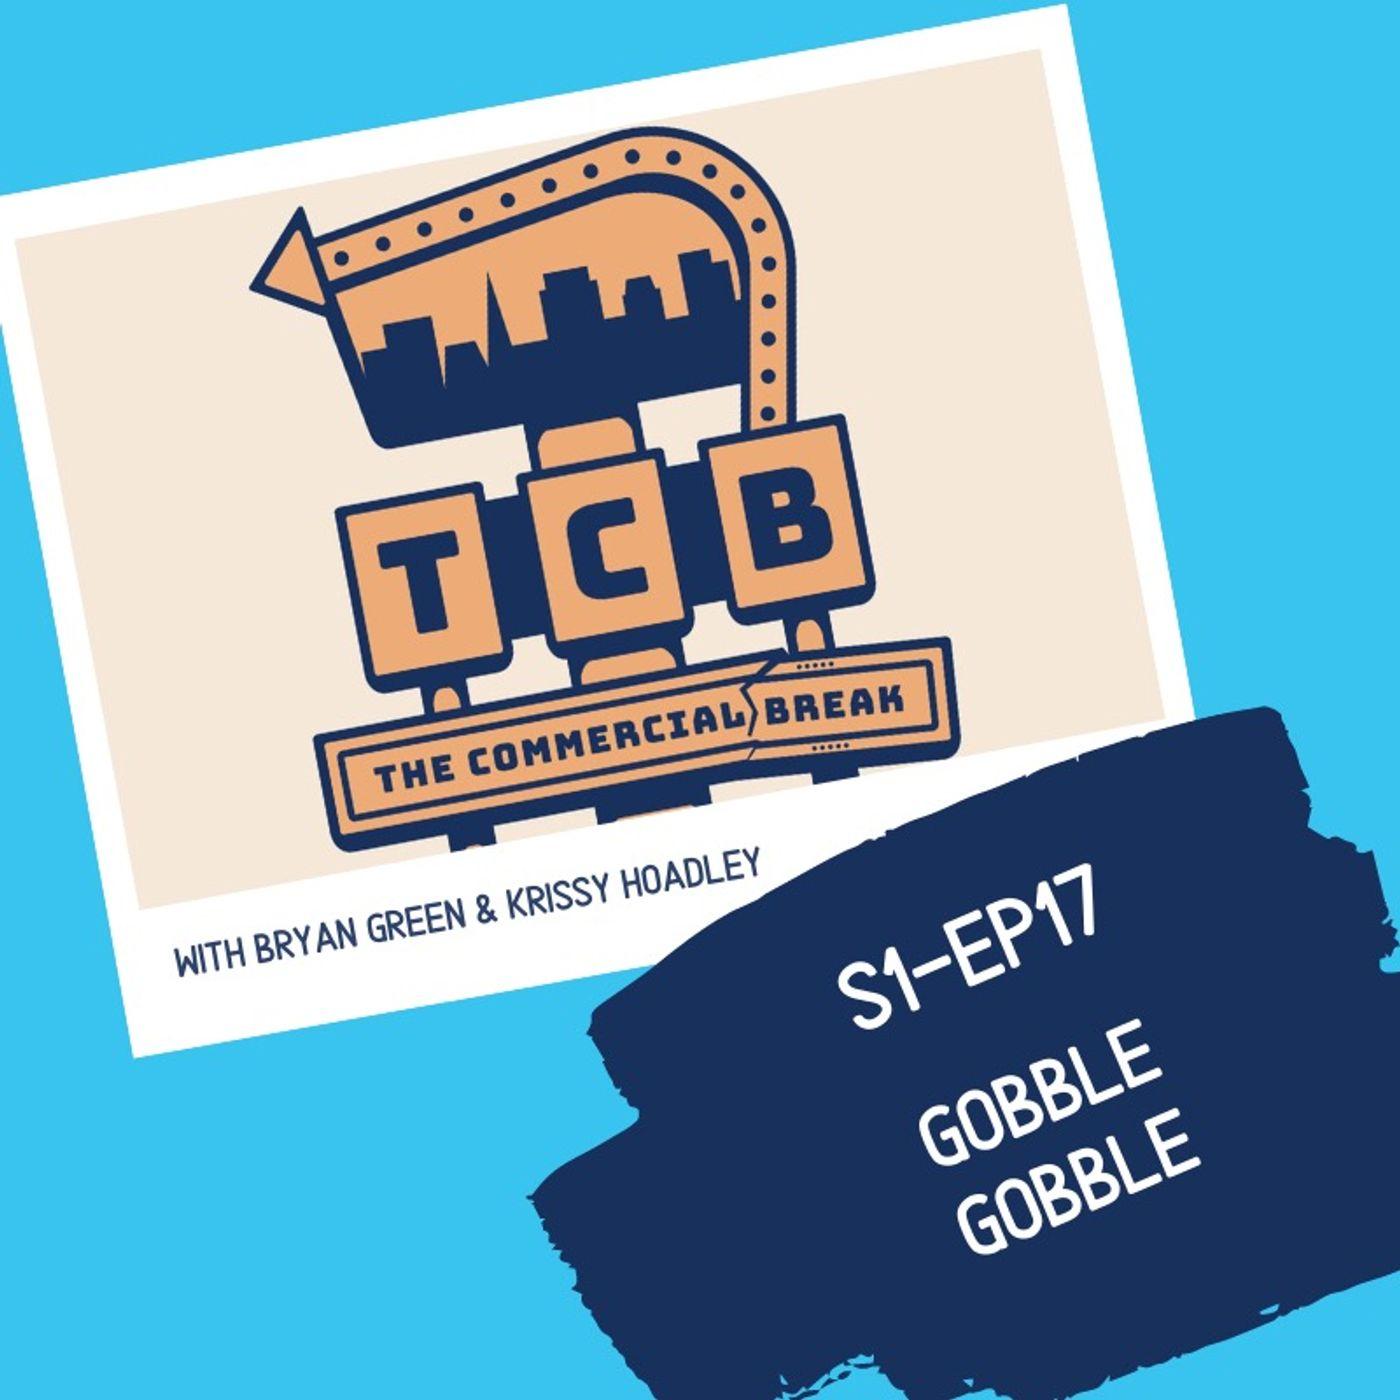 S1-EP17: Gobble Gobble